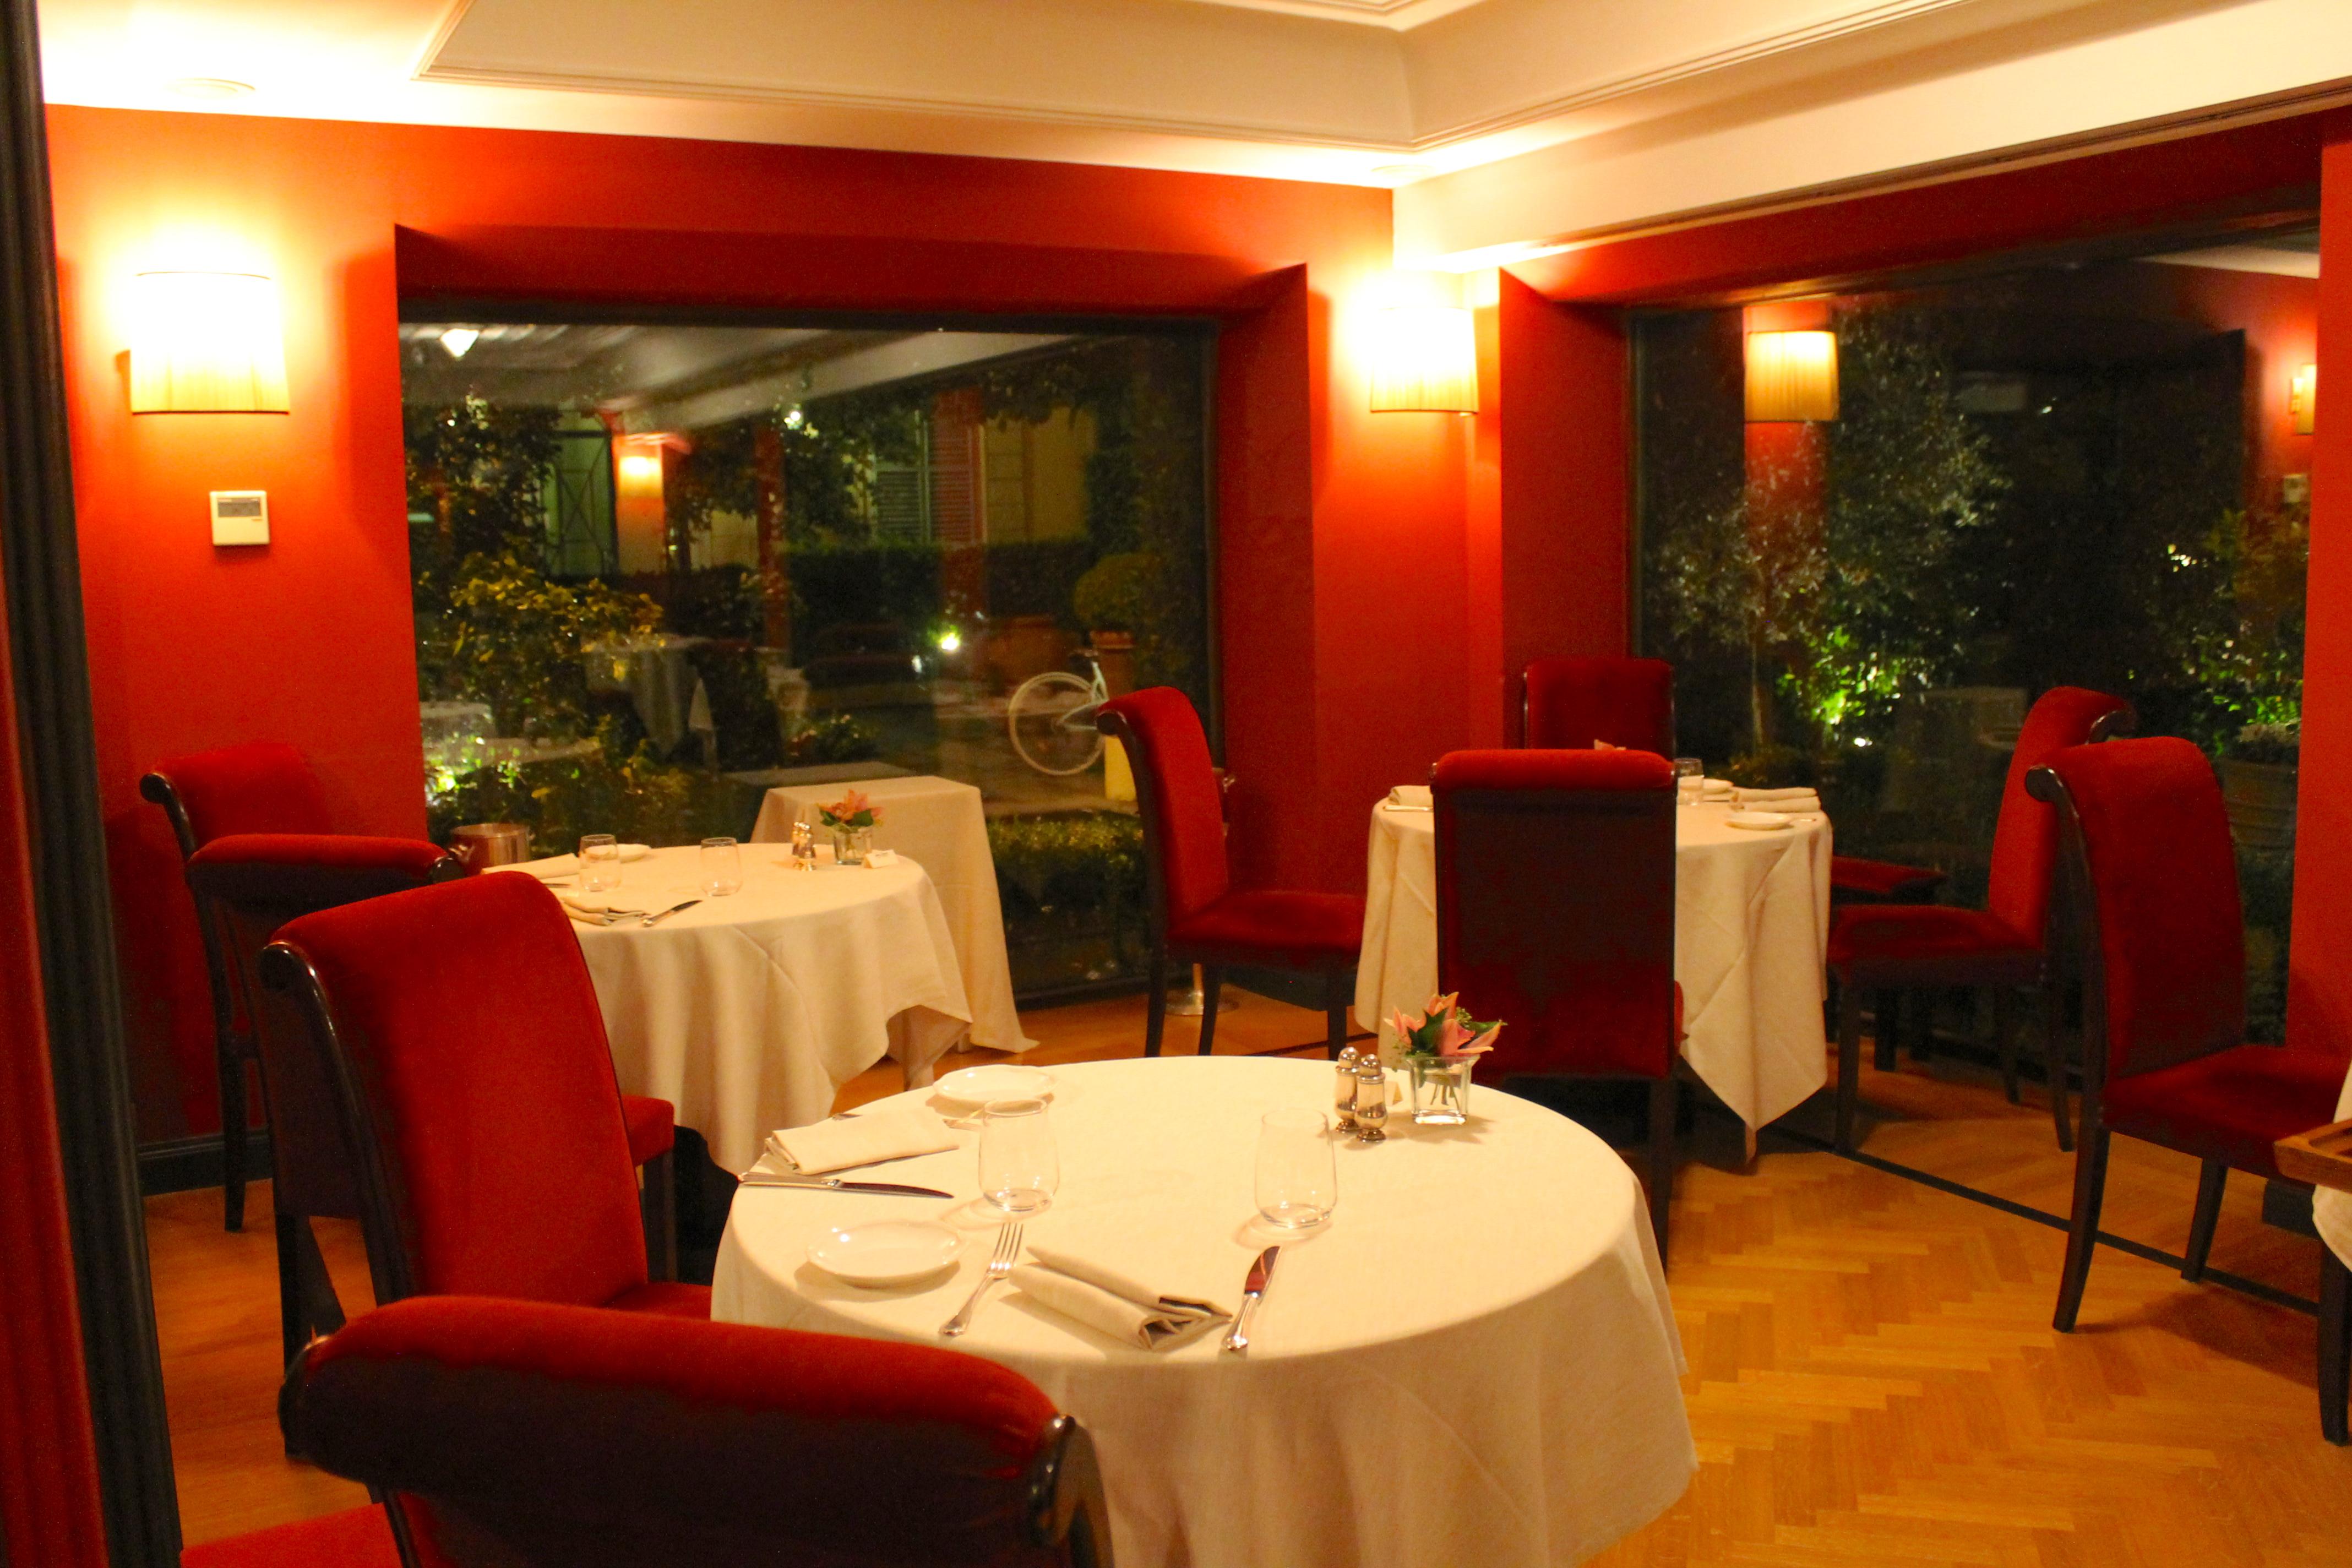 relais-le-jardin-restaurant-firenze-lusrforthesublime